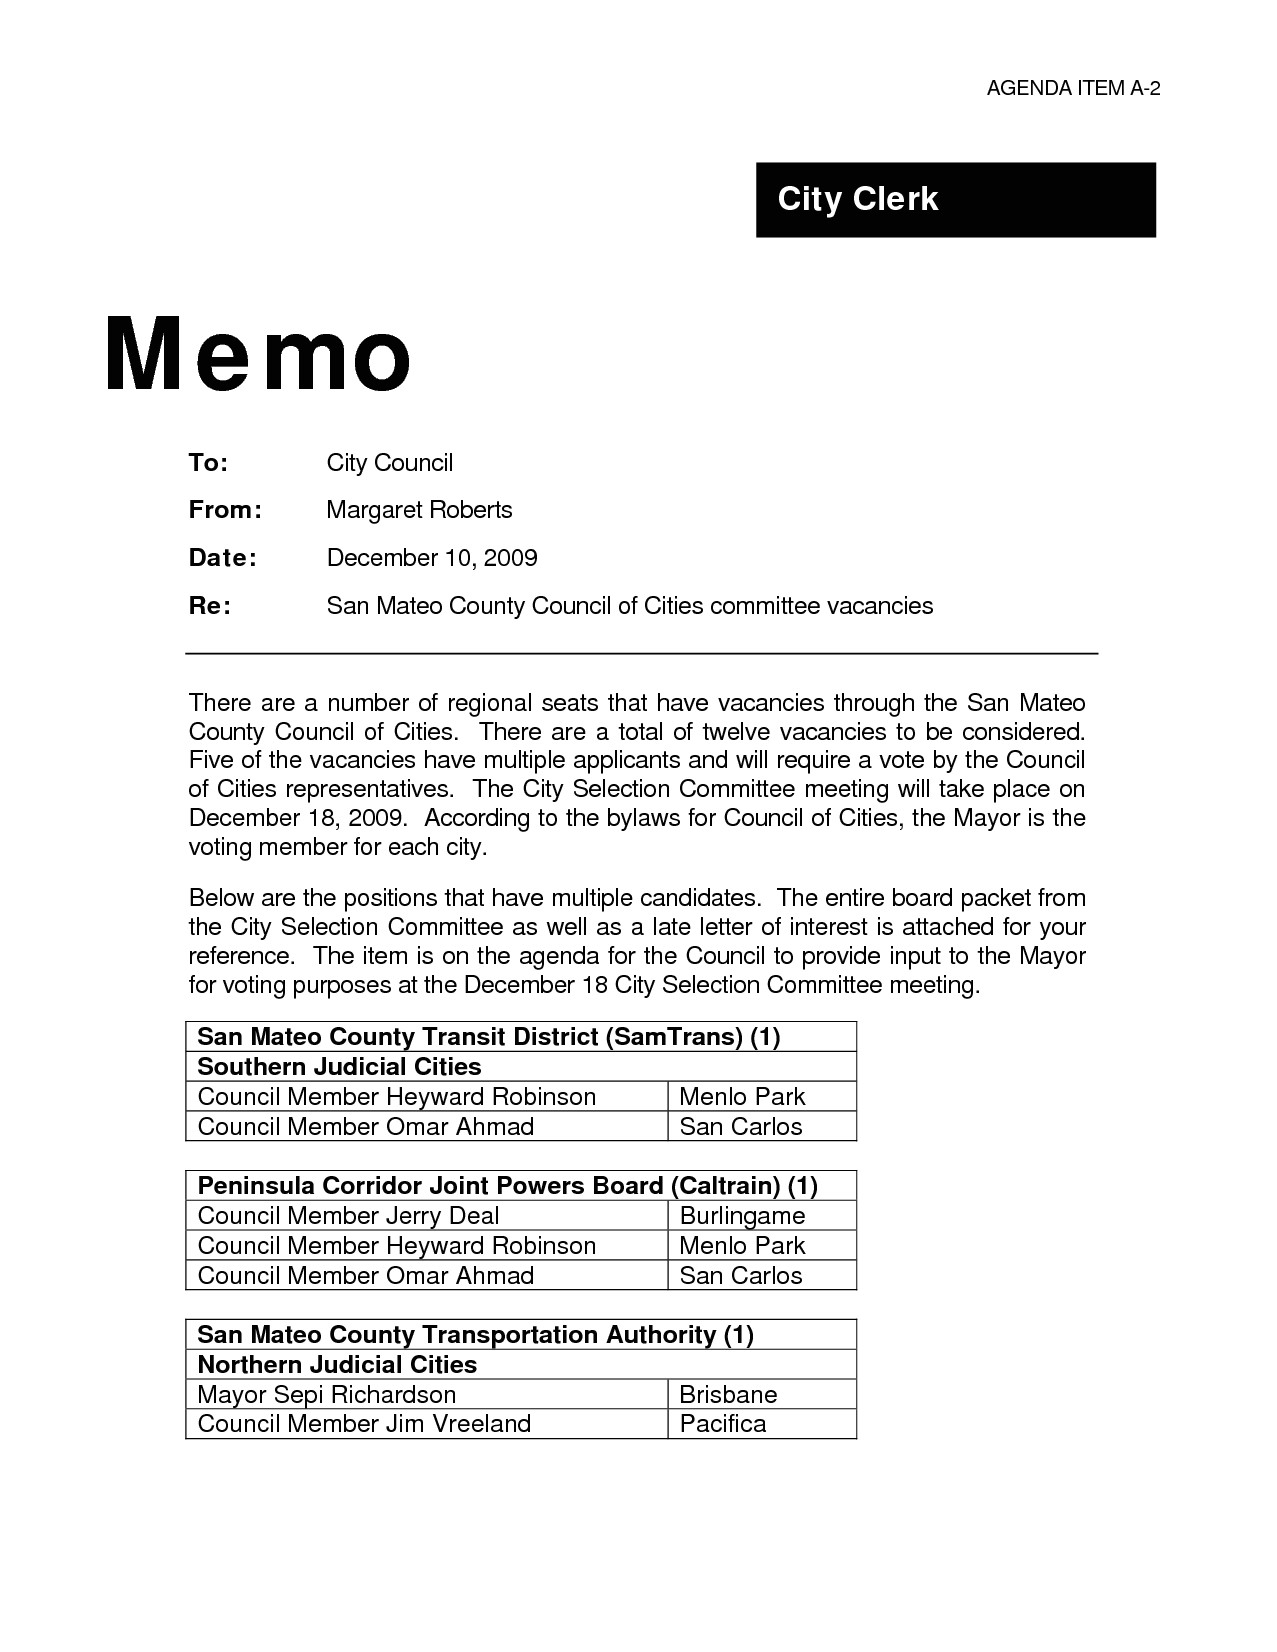 9 professional memo template